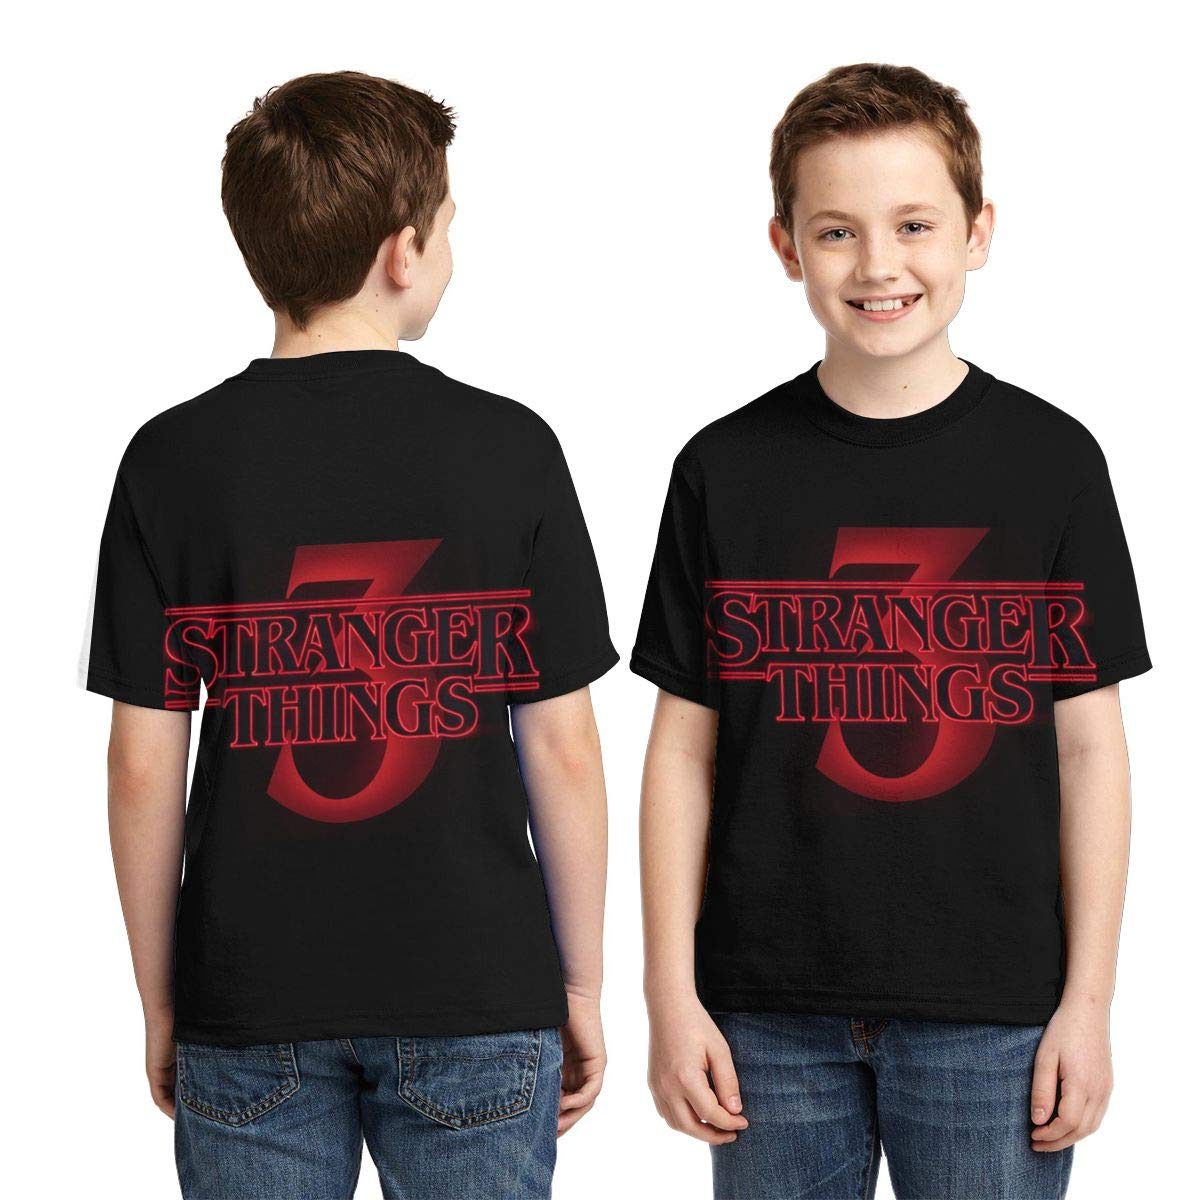 Hatstng Stranger Things 3 Poster Boys Girls 3D Print Crew Tee Youth Short Sleeve T-Shirt Tanks Tops